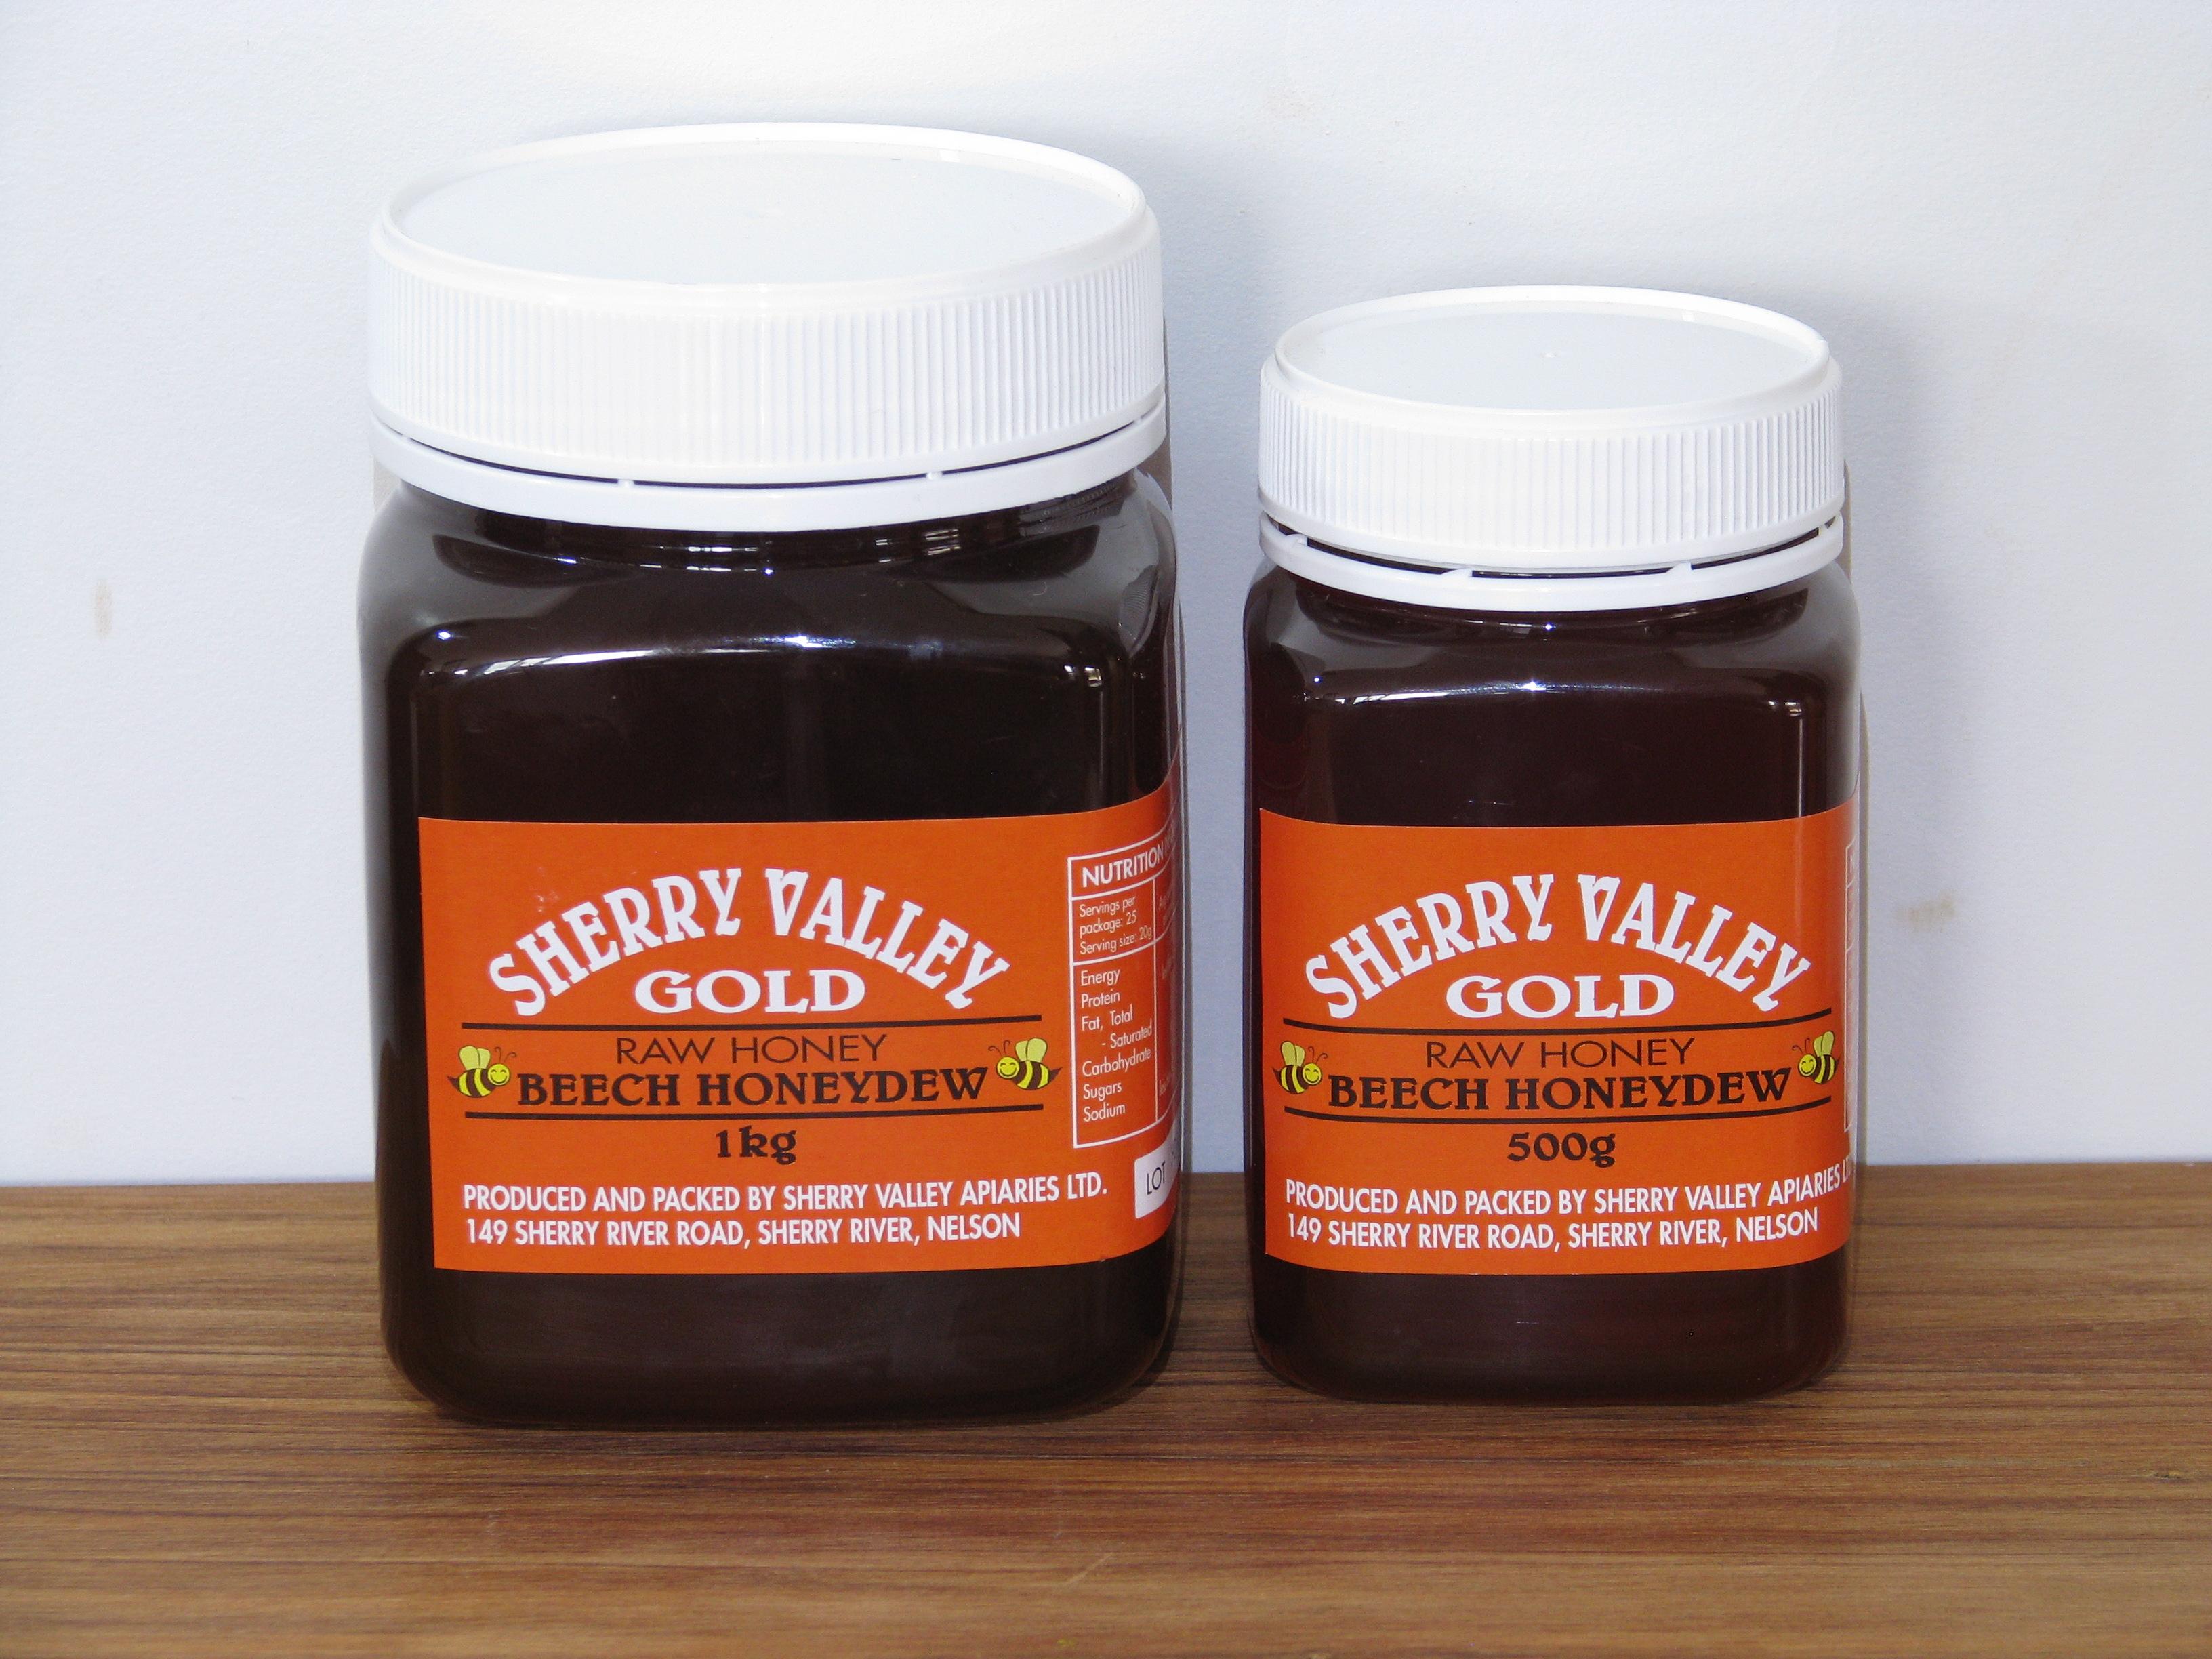 Beech Honeydew Honey